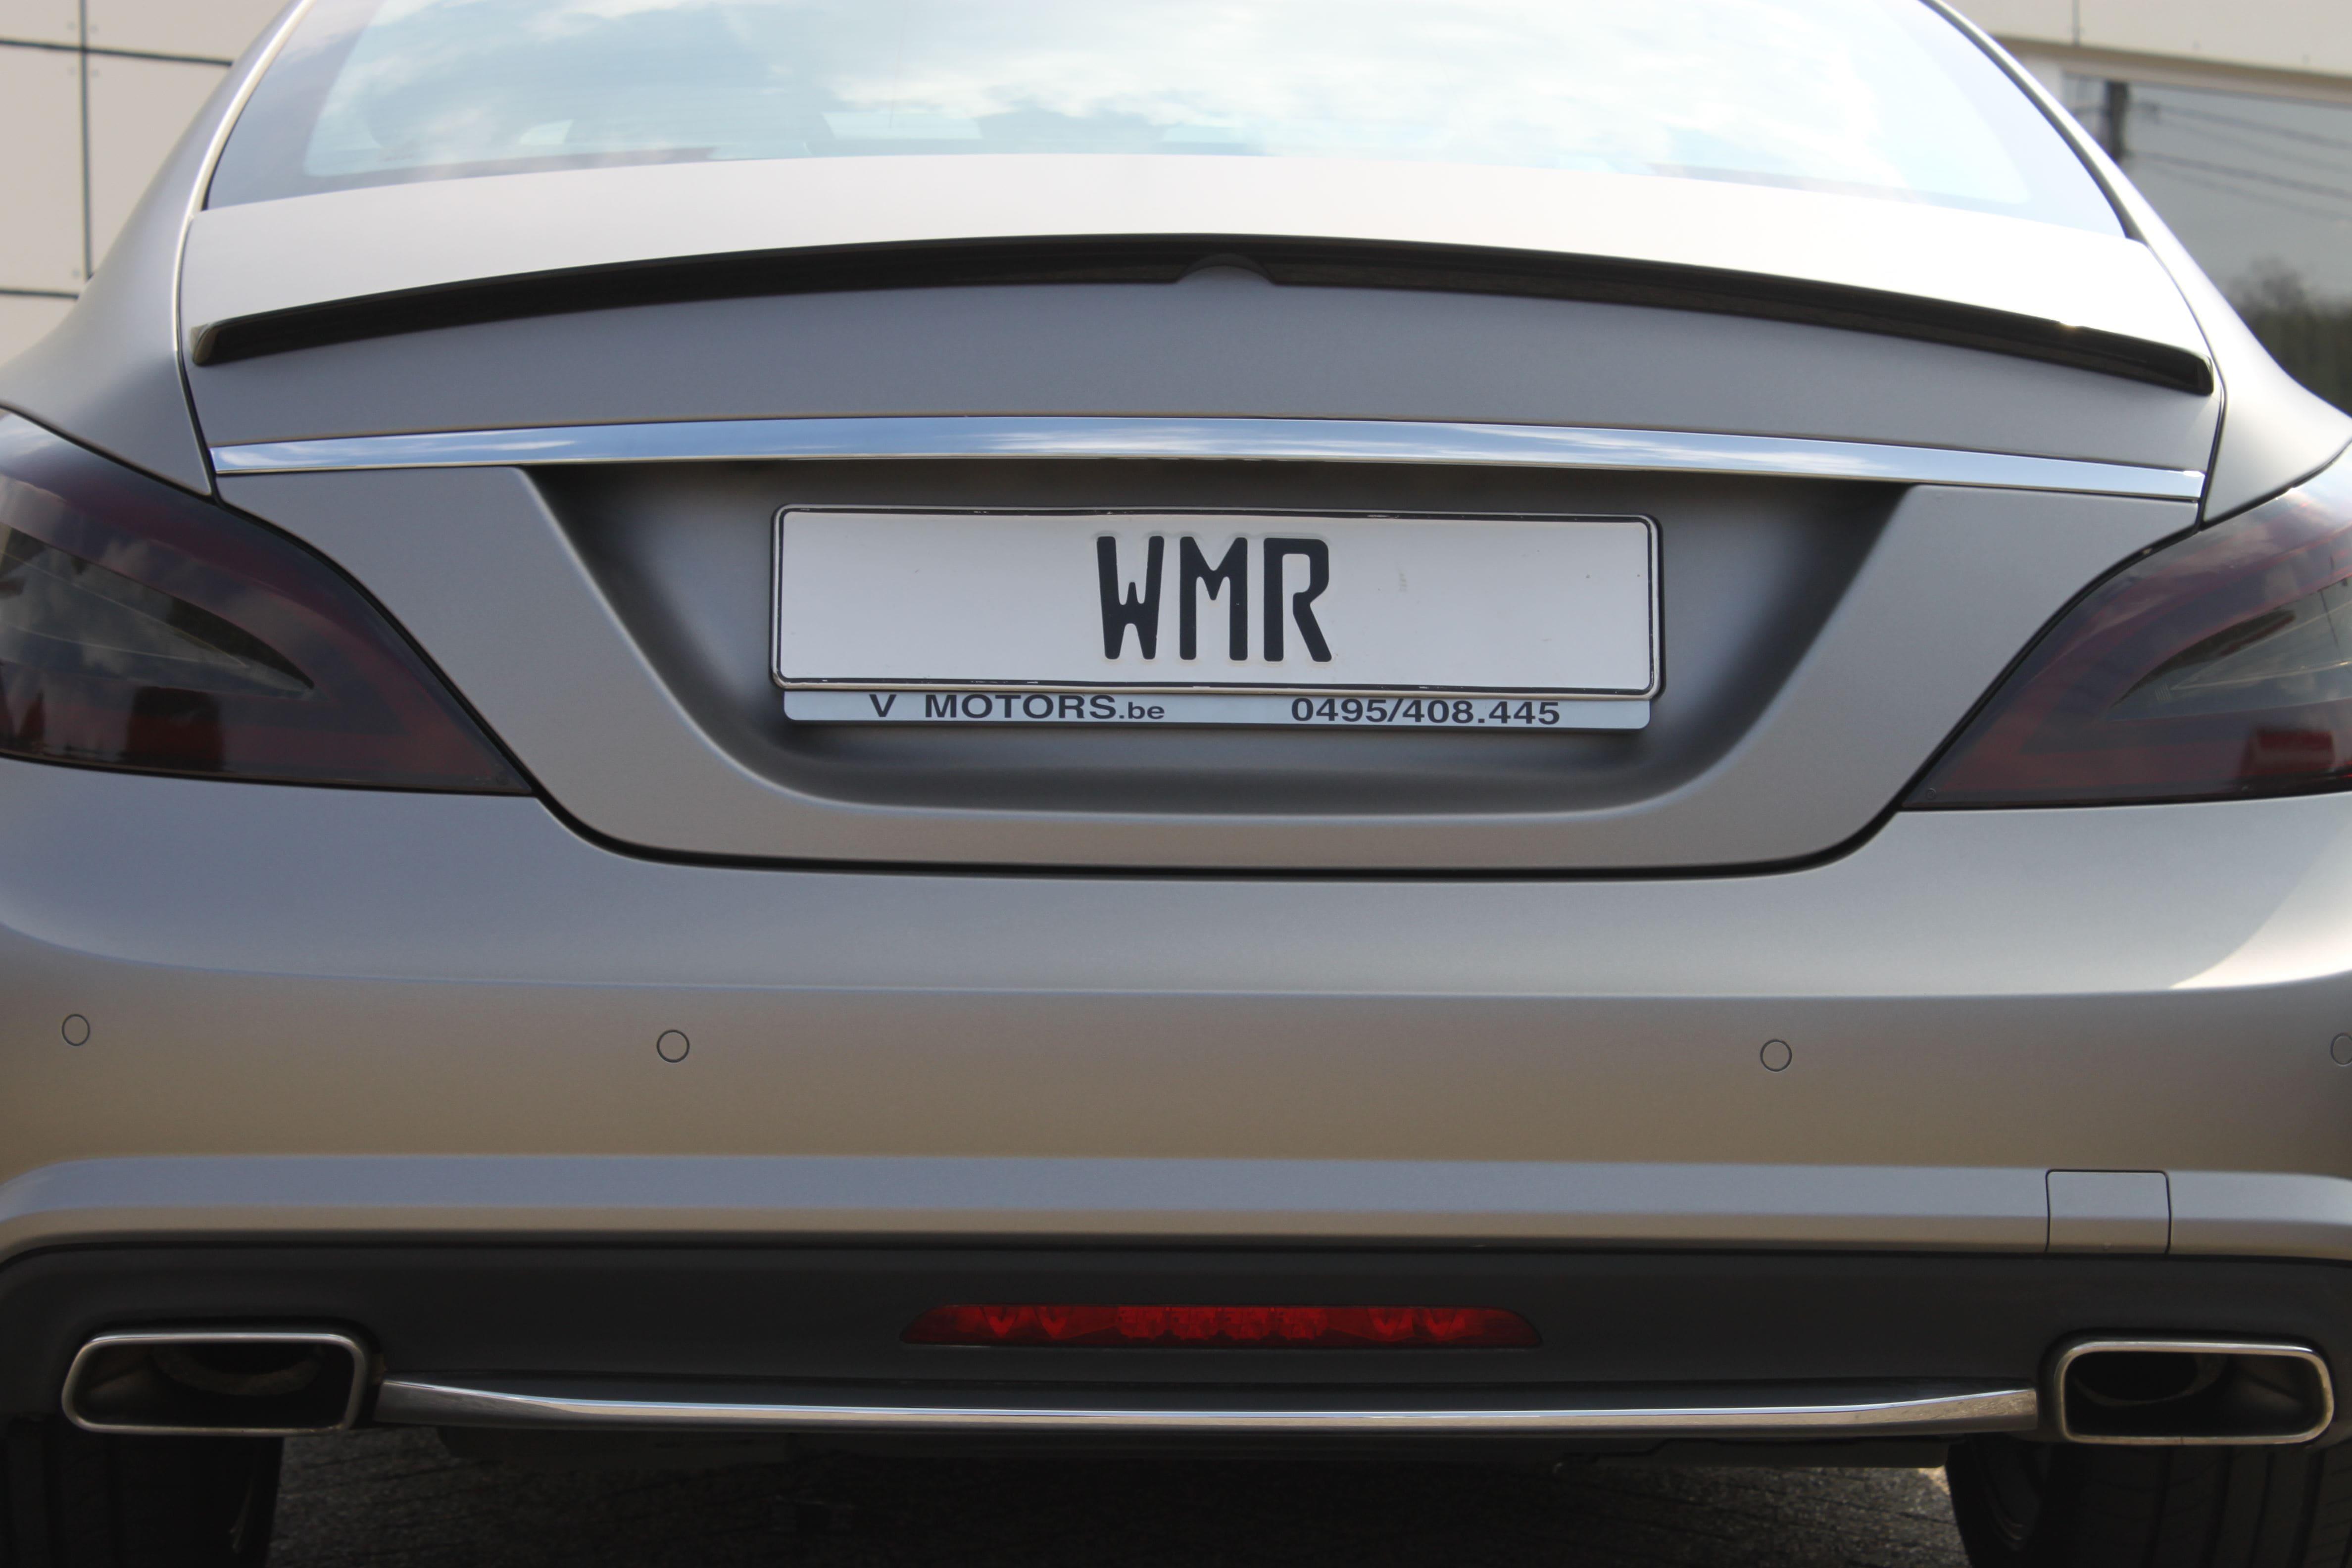 Mercedes CLS met Mat Grey Aluminium Wrap, Carwrapping door Wrapmyride.nu Foto-nr:6168, ©2020